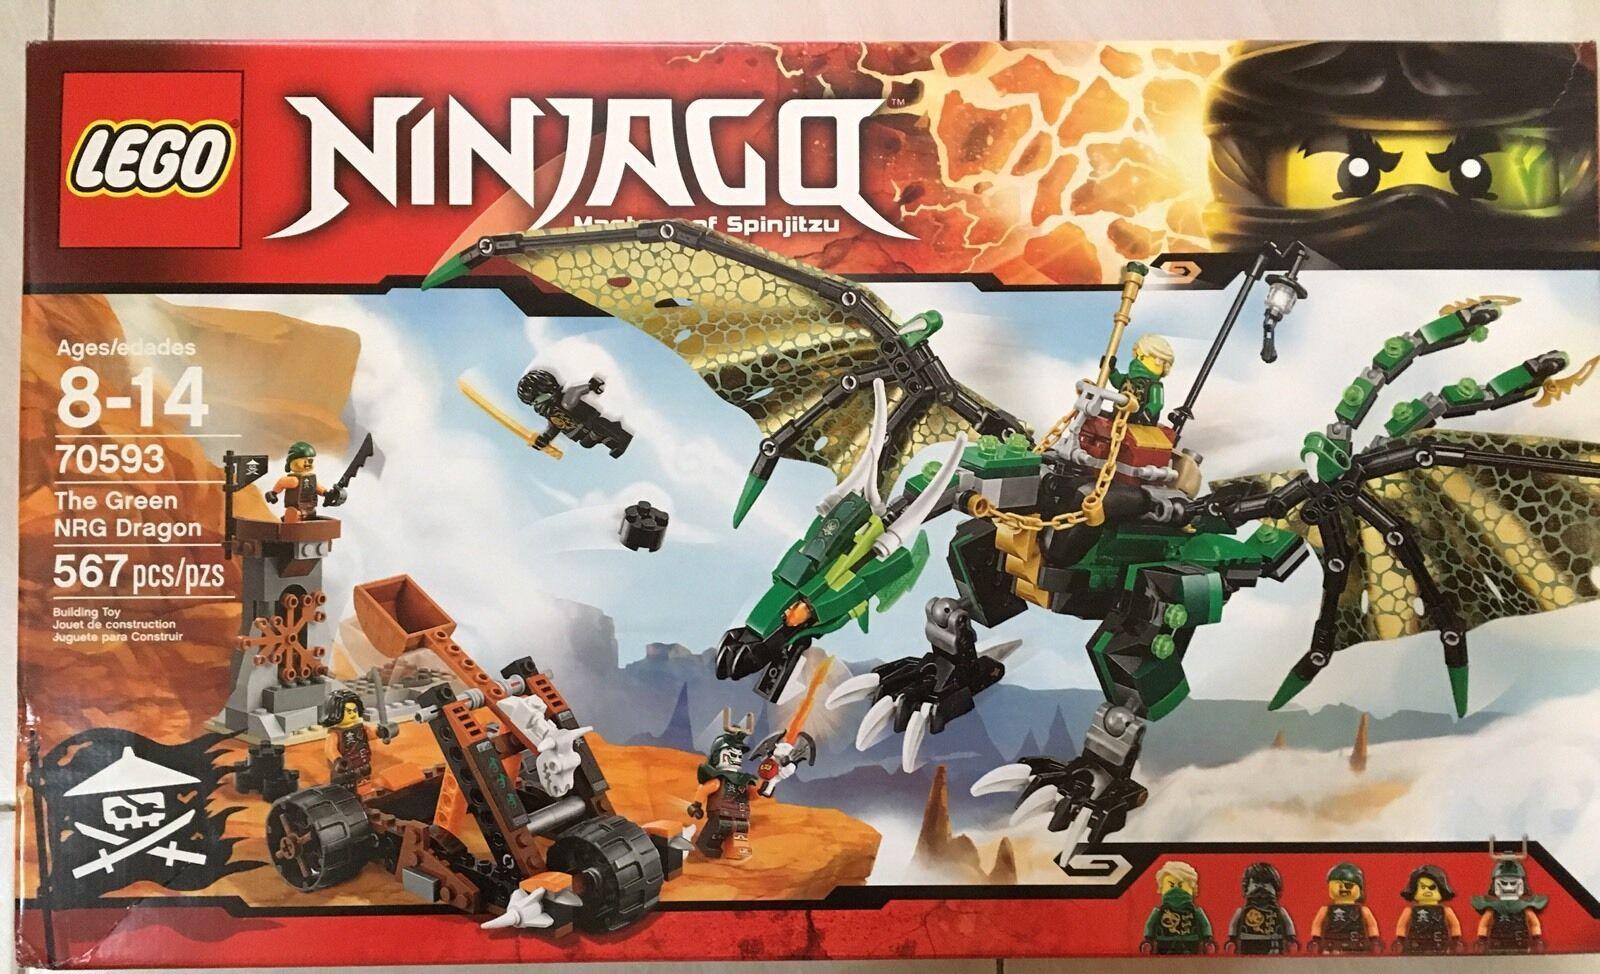 Lego Ninjago Skybound 70593 le vert NRG Dragon   magasin d'offre